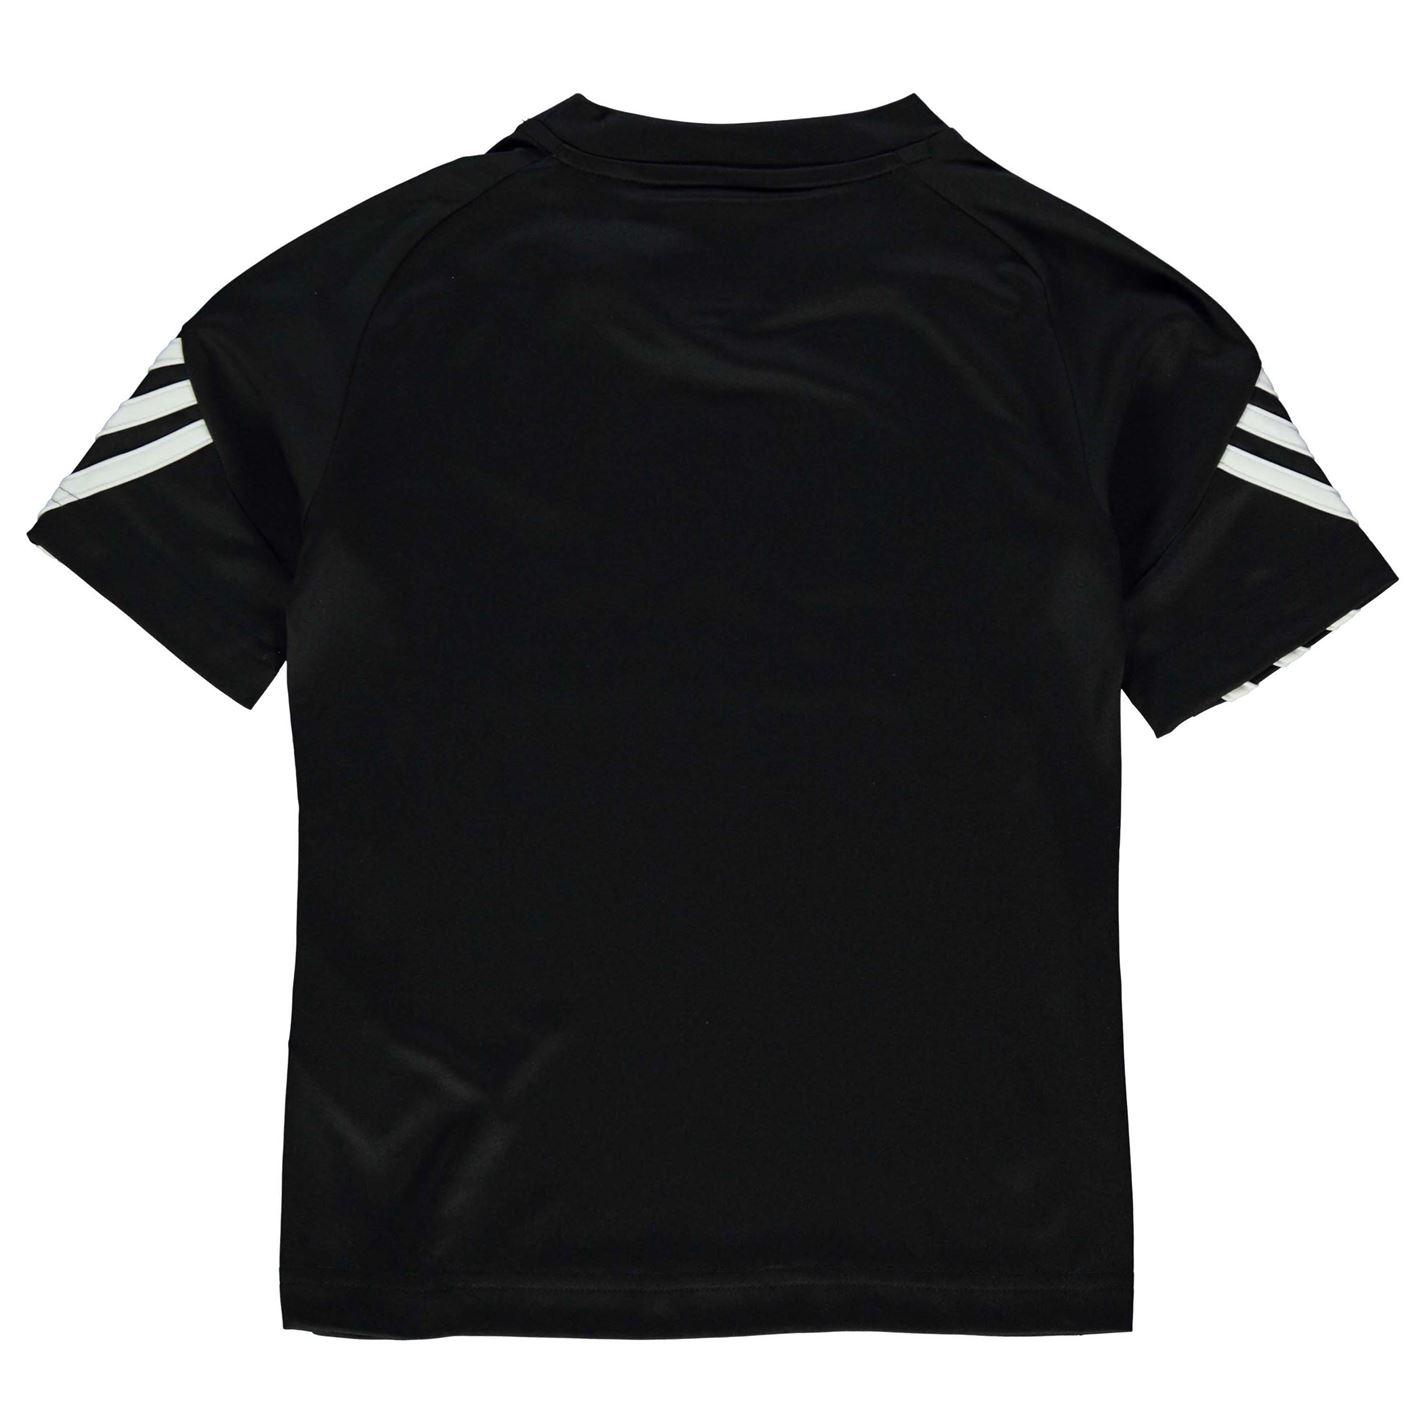 ADIDAS Sereno T Shirt Youngster Ragazzi Manica Corta Performance Tee Top Girocollo